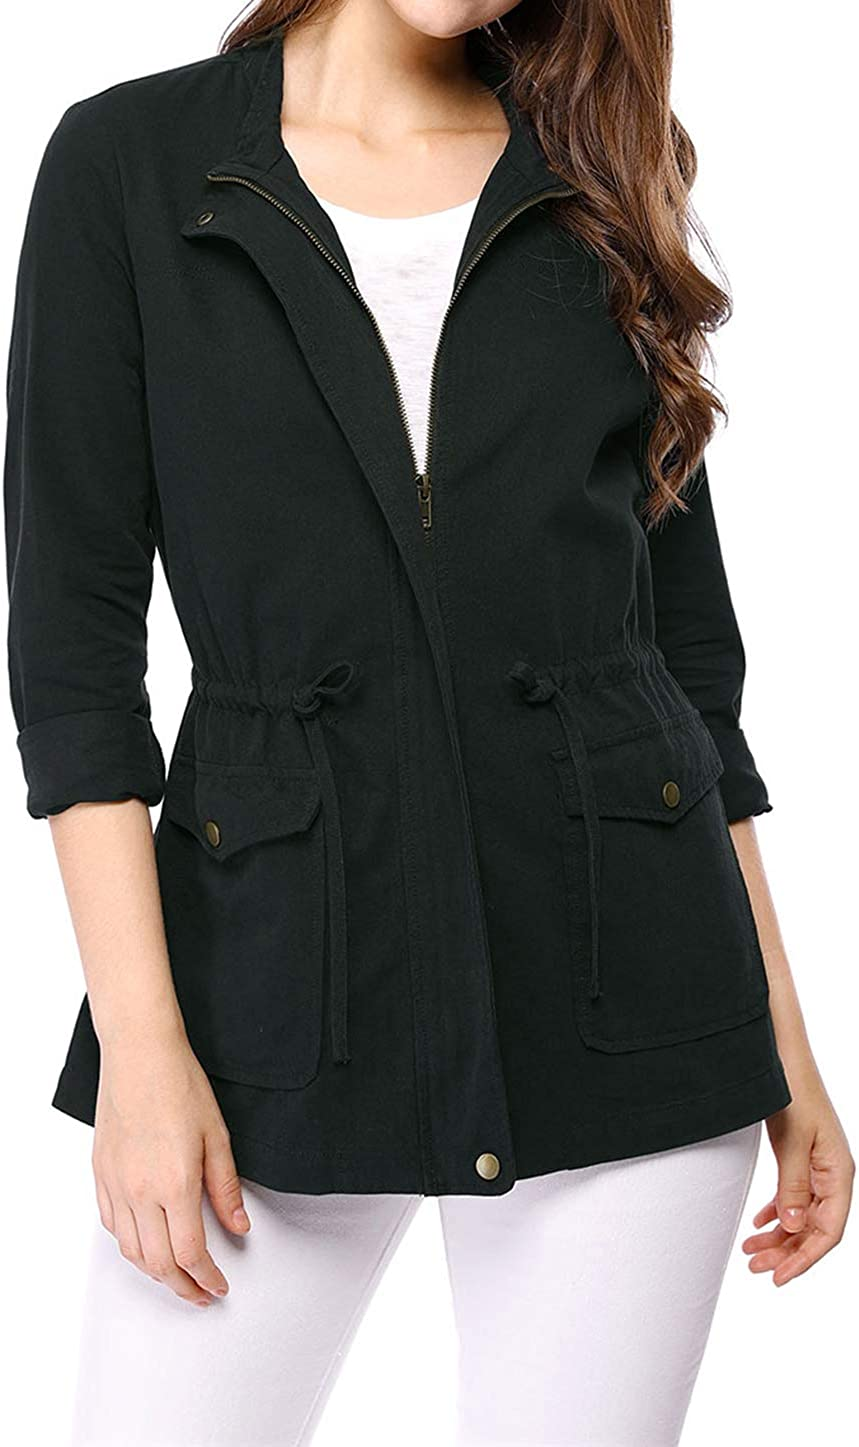 Allegra K Women's Winter Fall Zip Up Jacket Drawstring Waist Casual Coat